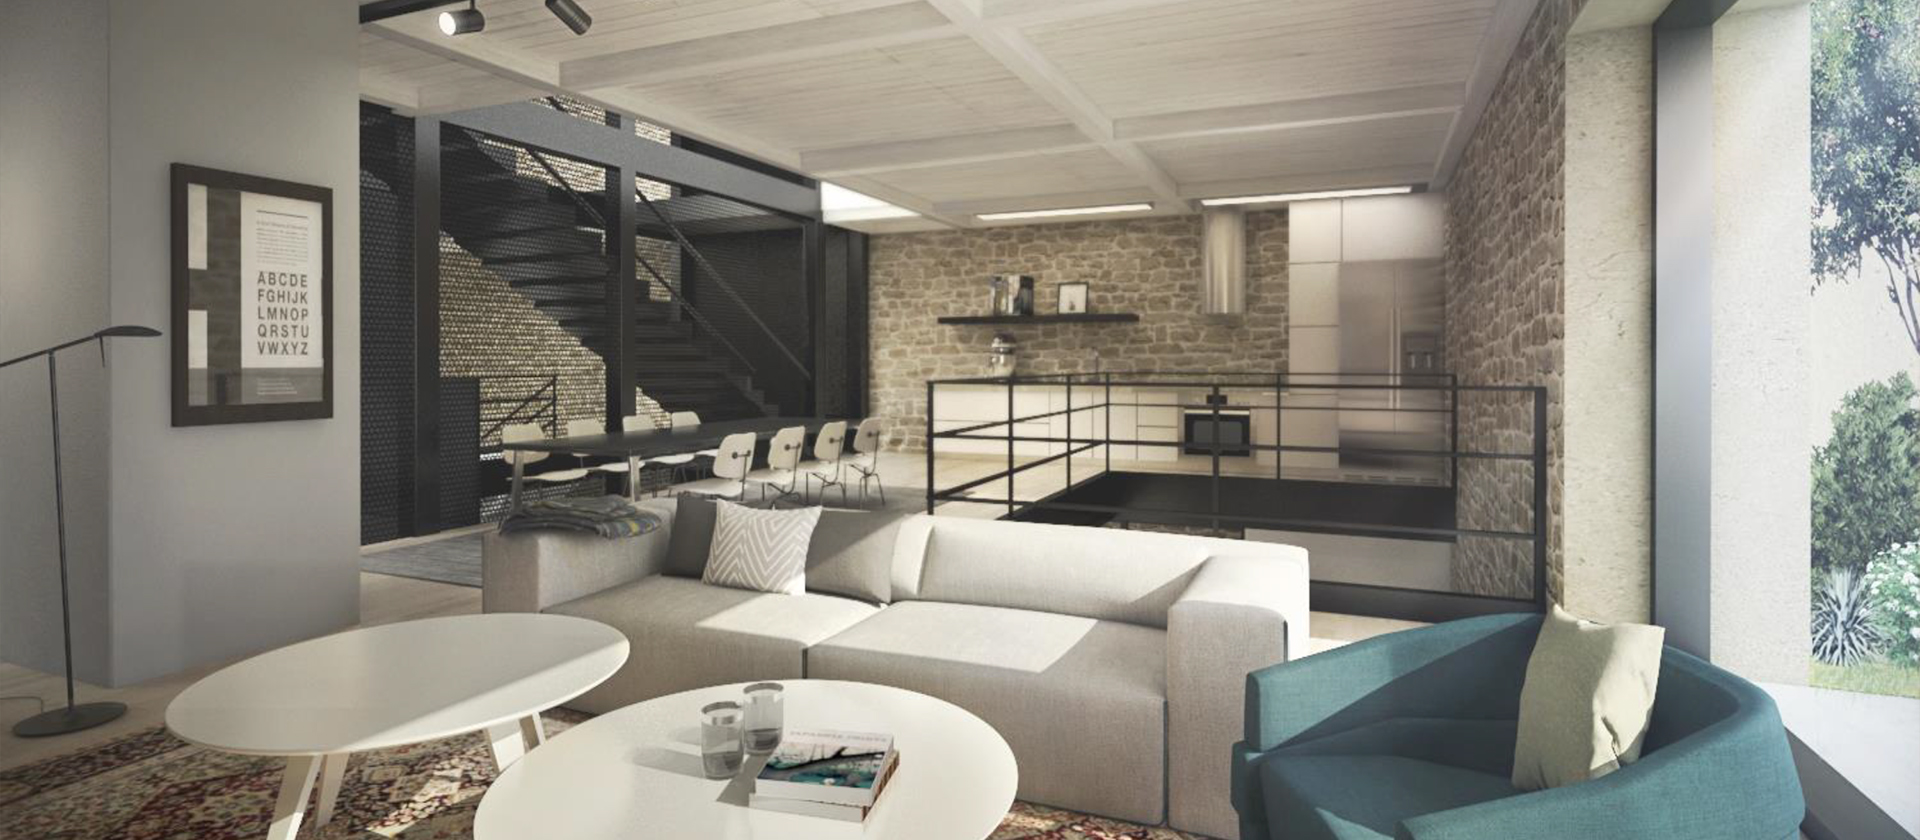 fidi italy interior design school in florence design school